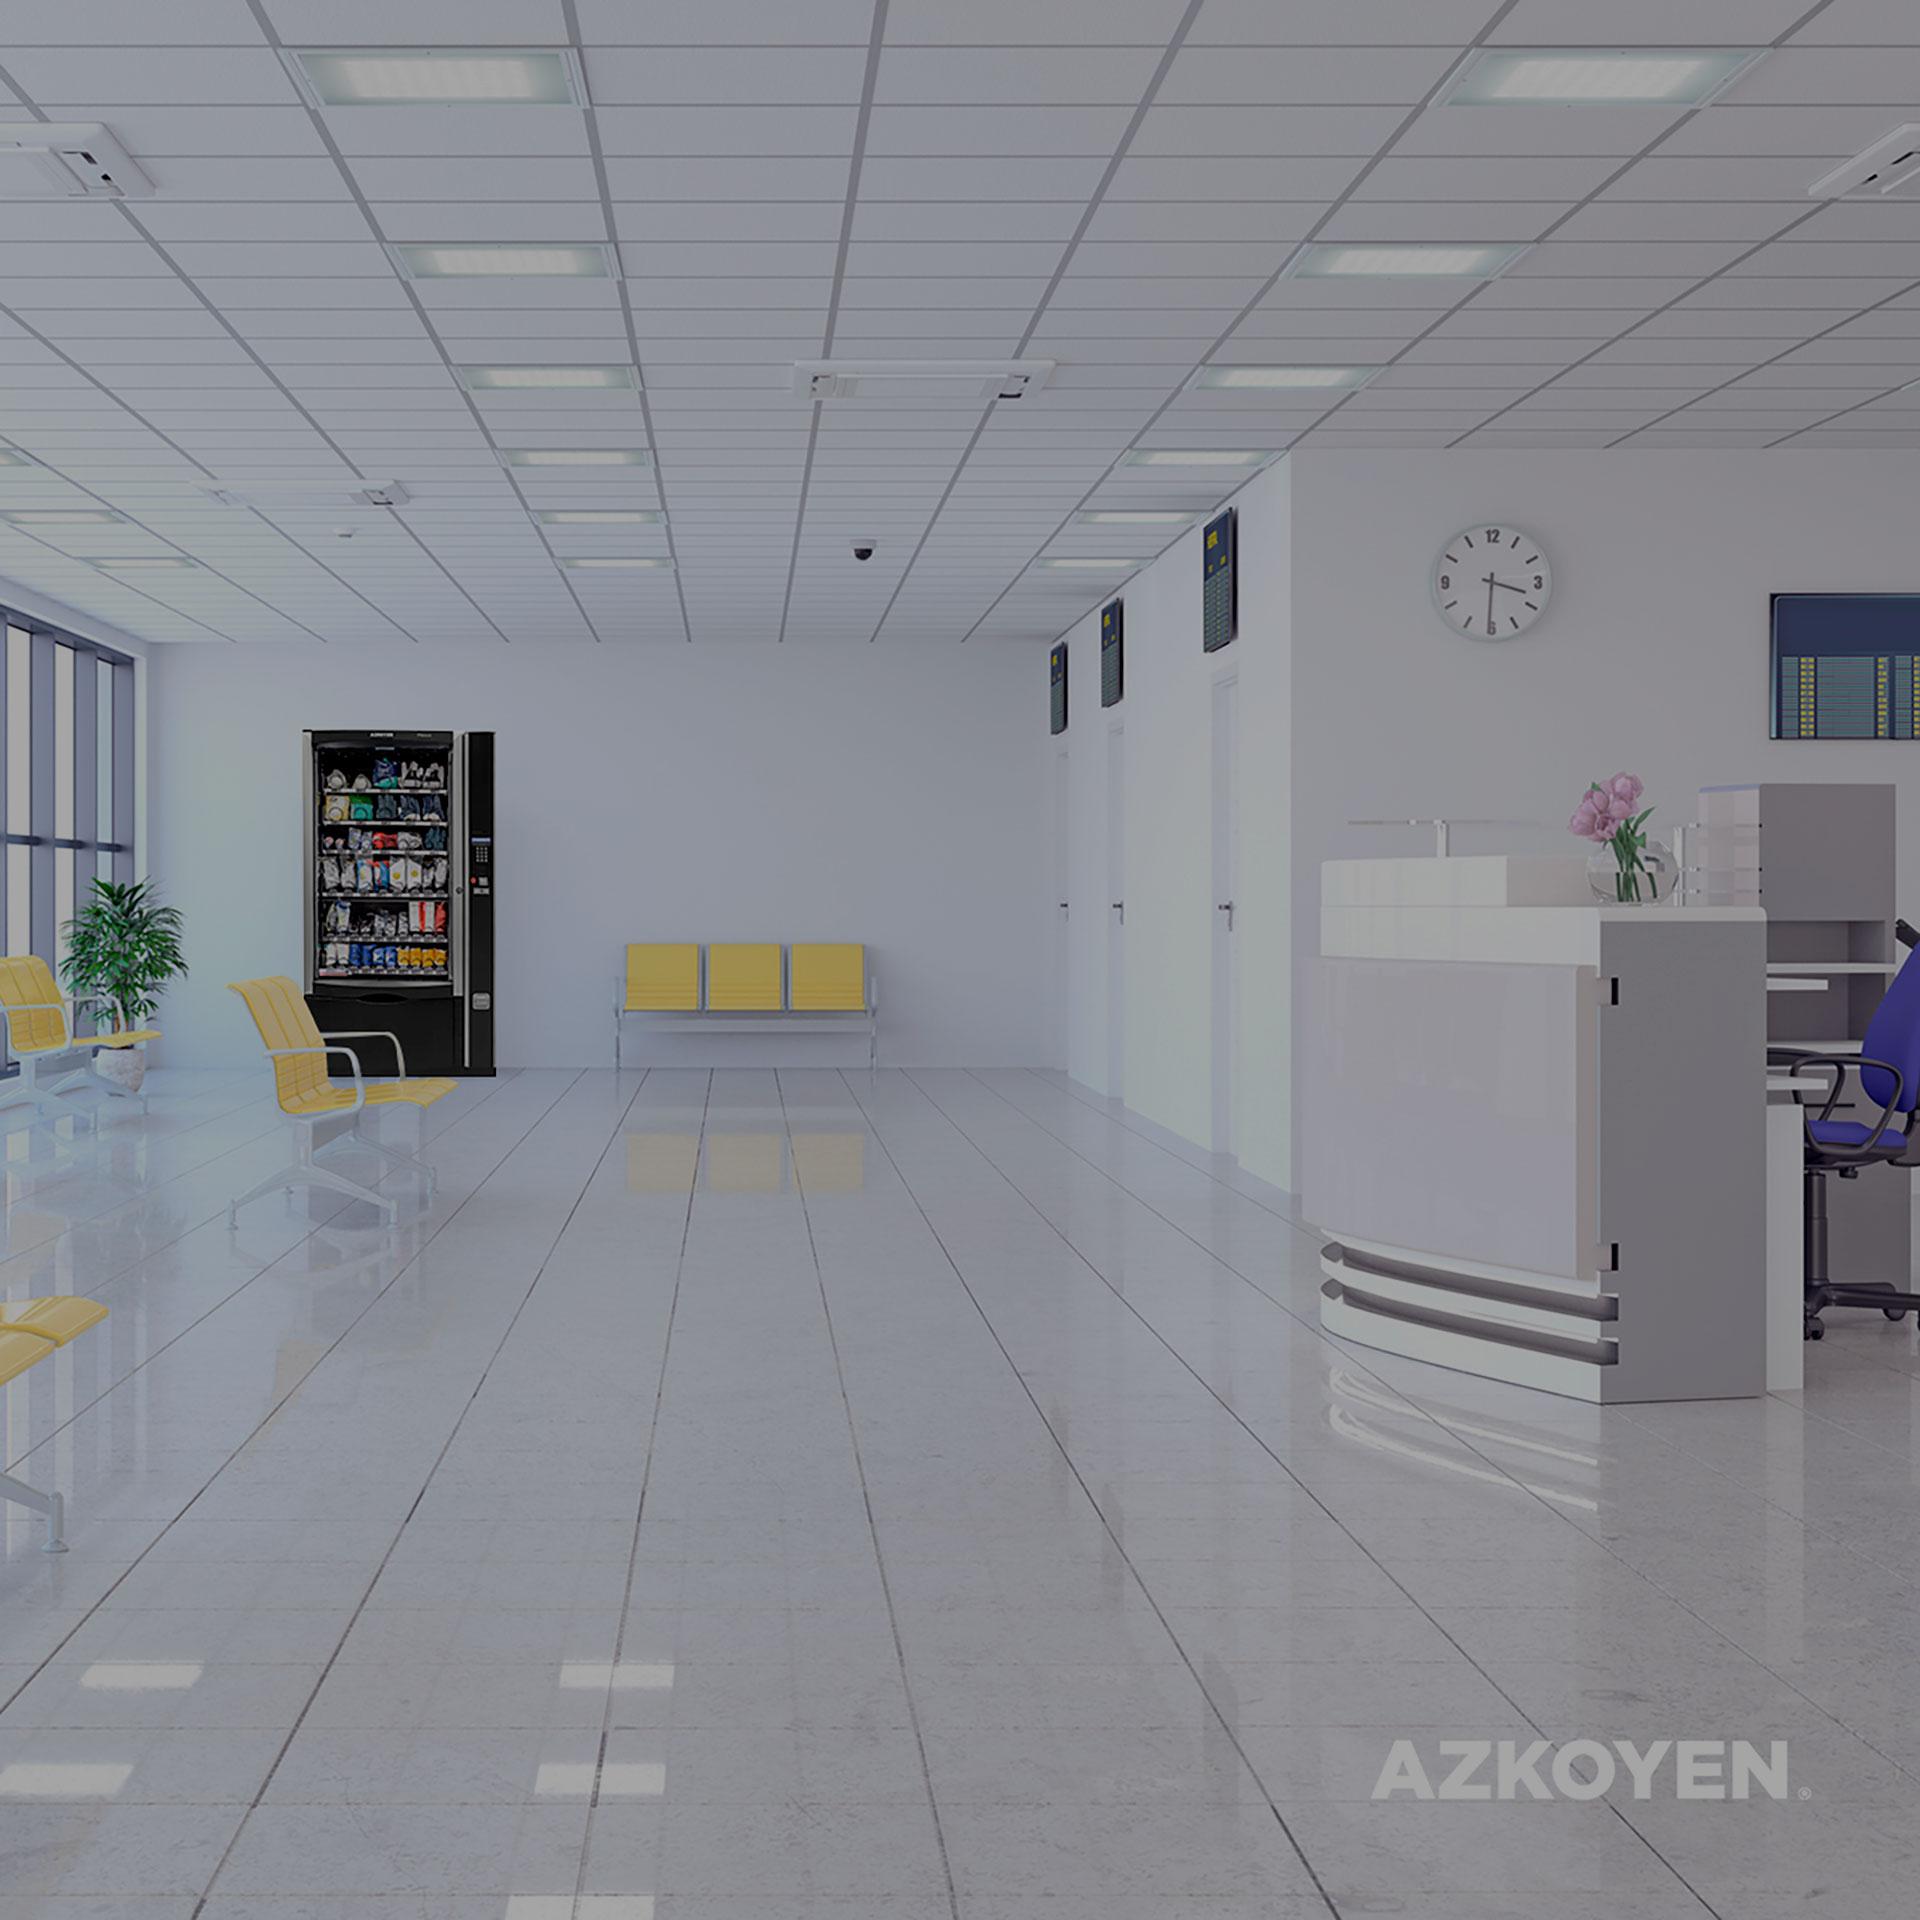 Azkoyen is working to distribute free PPE using its automatic machines